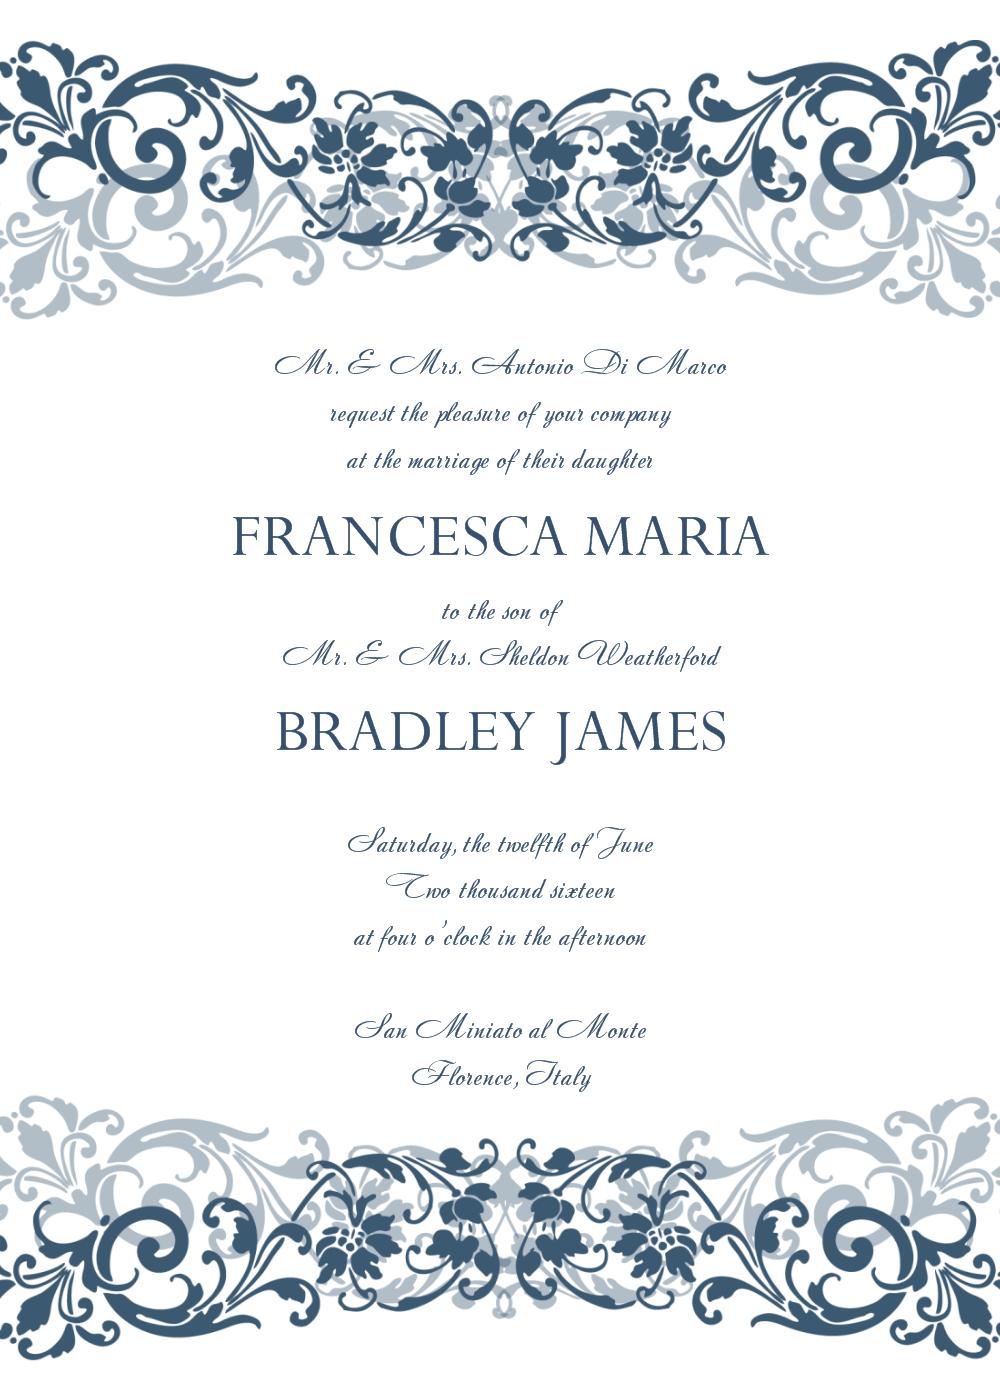 Free Wedding Invitation Templates For Word | Wedding Invitation - Free Printable Wedding Cards